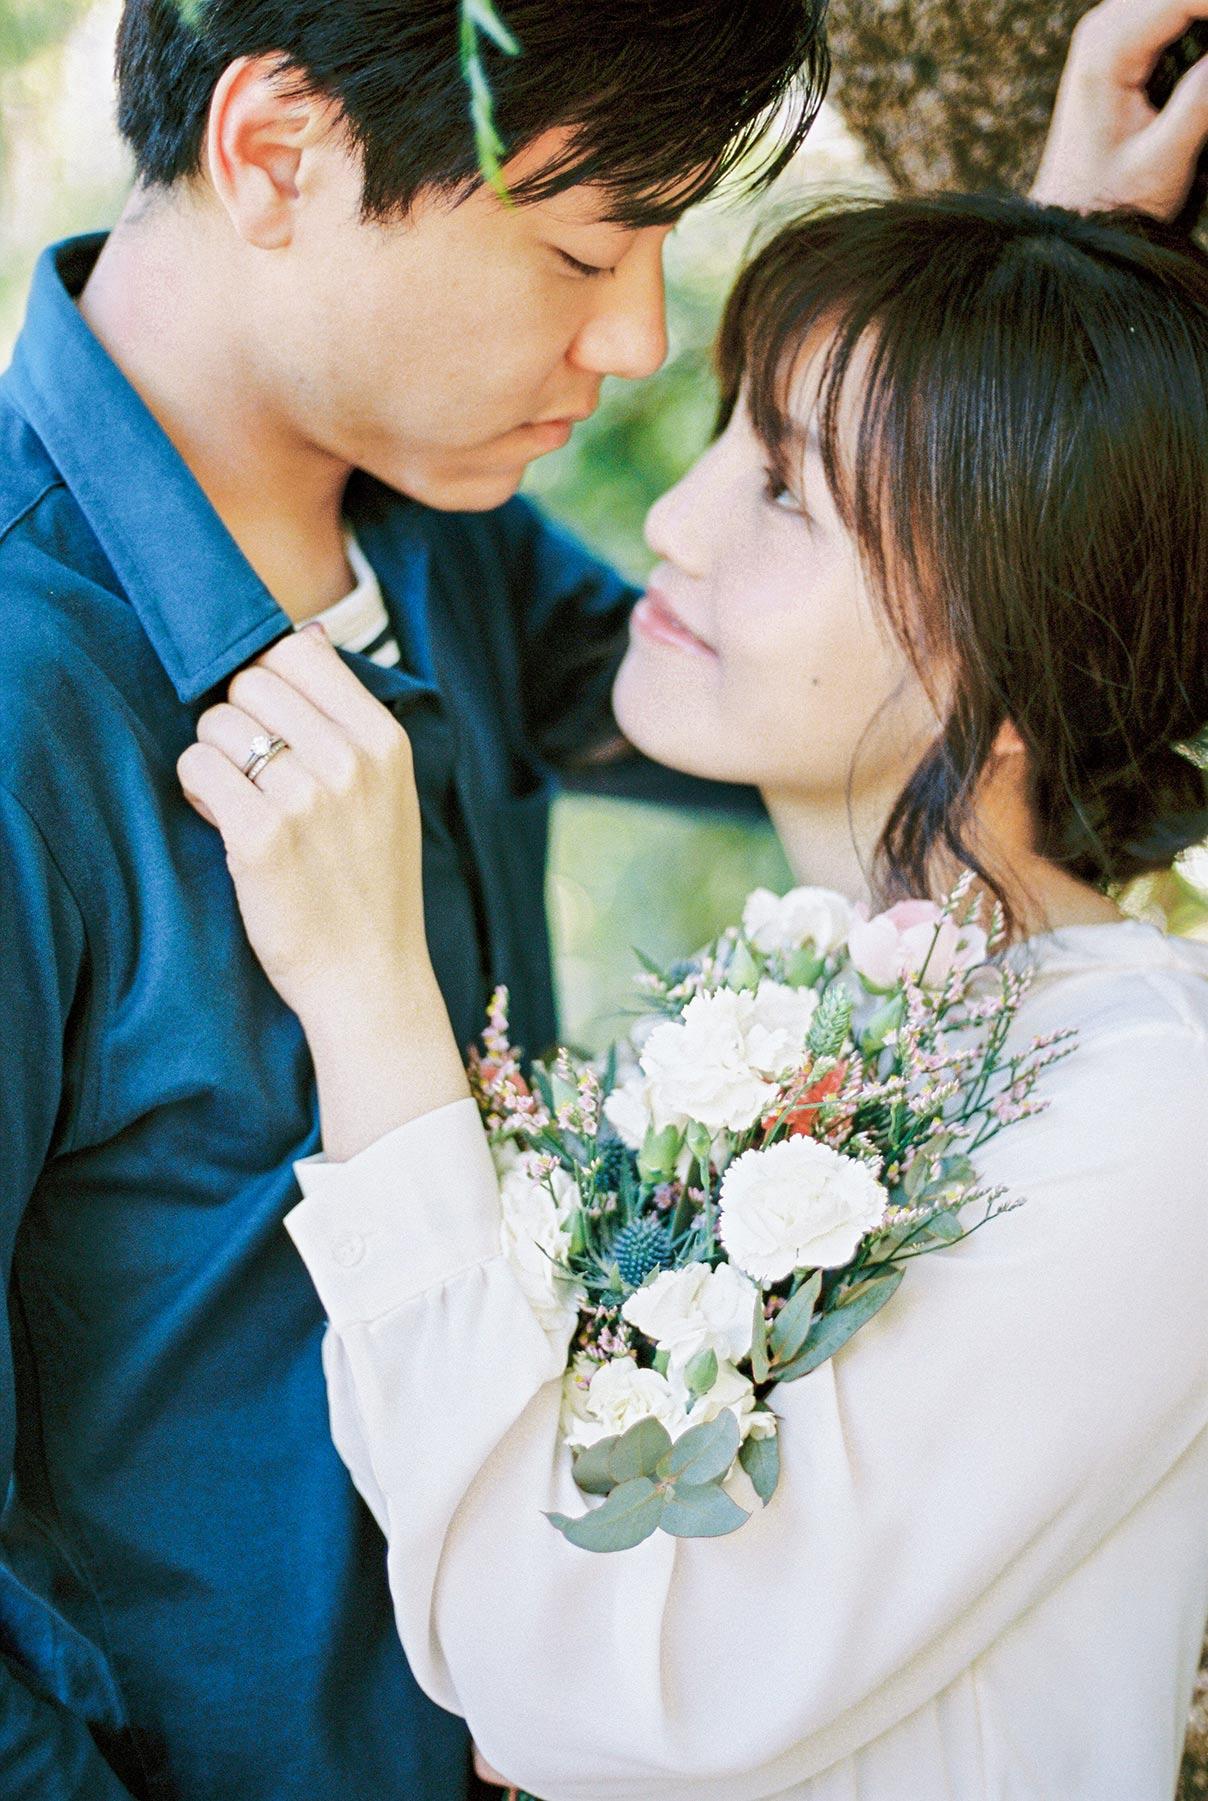 Beautiful young couple | Fin Art Photographer | Lena Karelova Photography | Barcelona Film Wedding Photographer